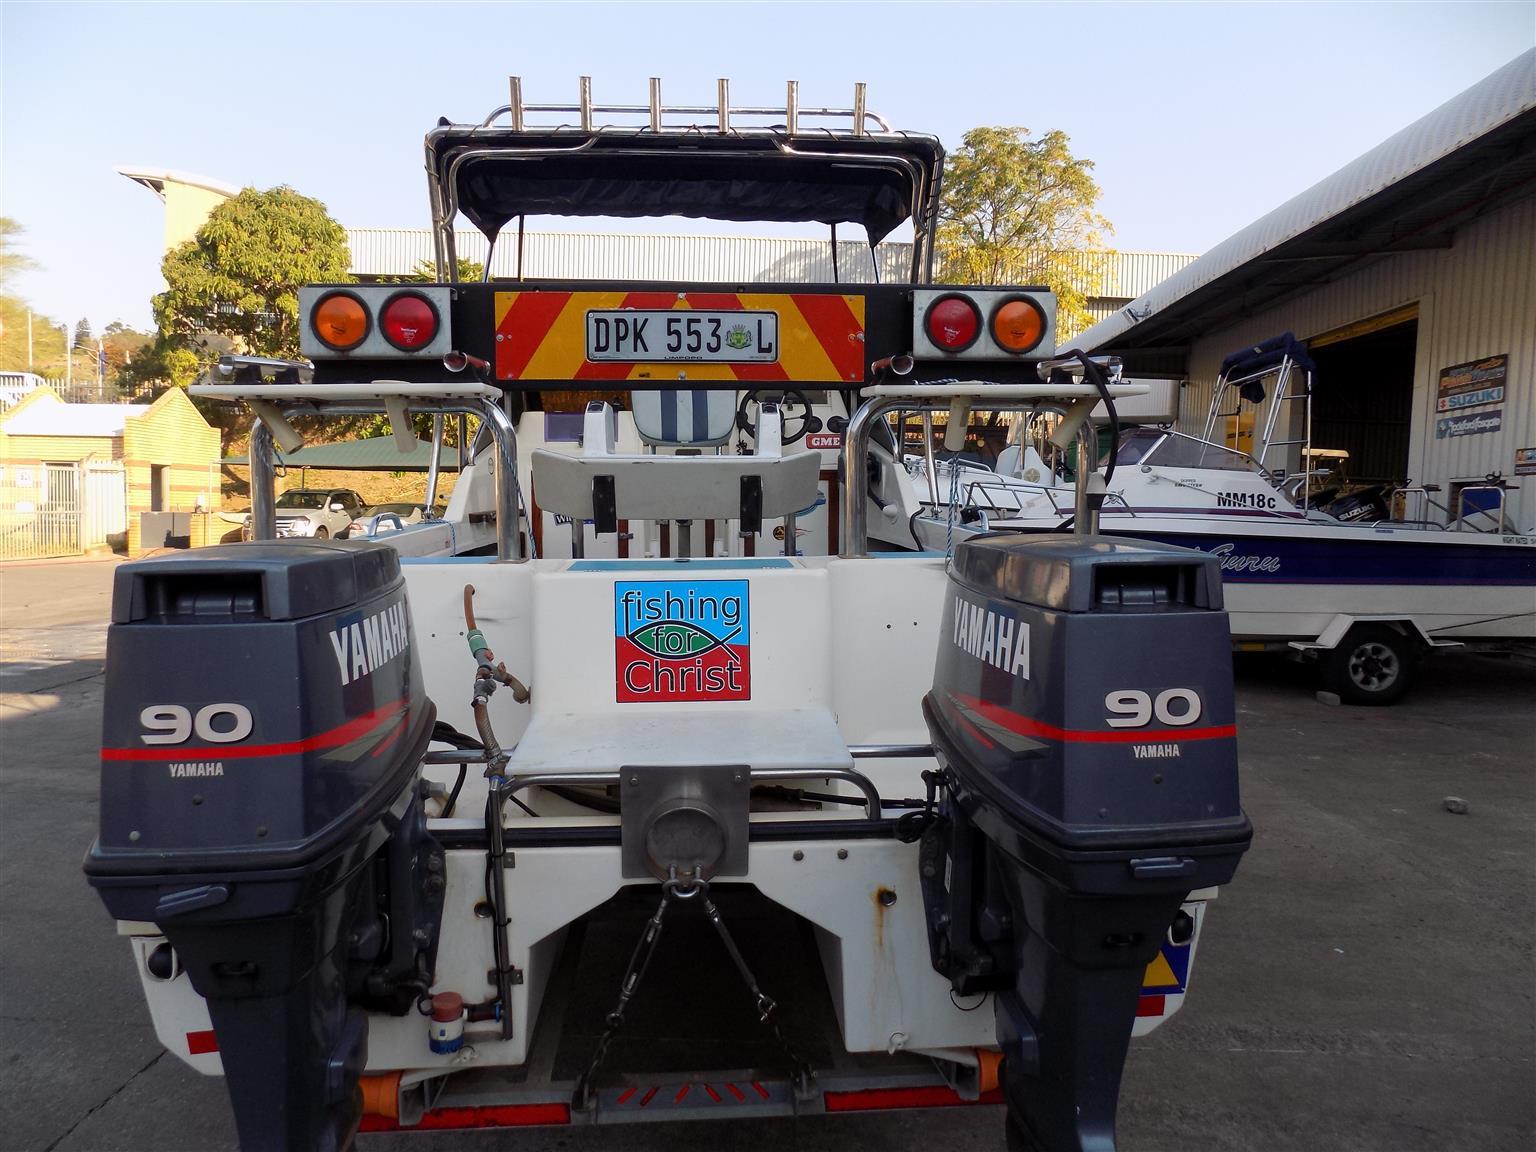 cobra cat 525 on trailer 2 x 90 hp yamaha